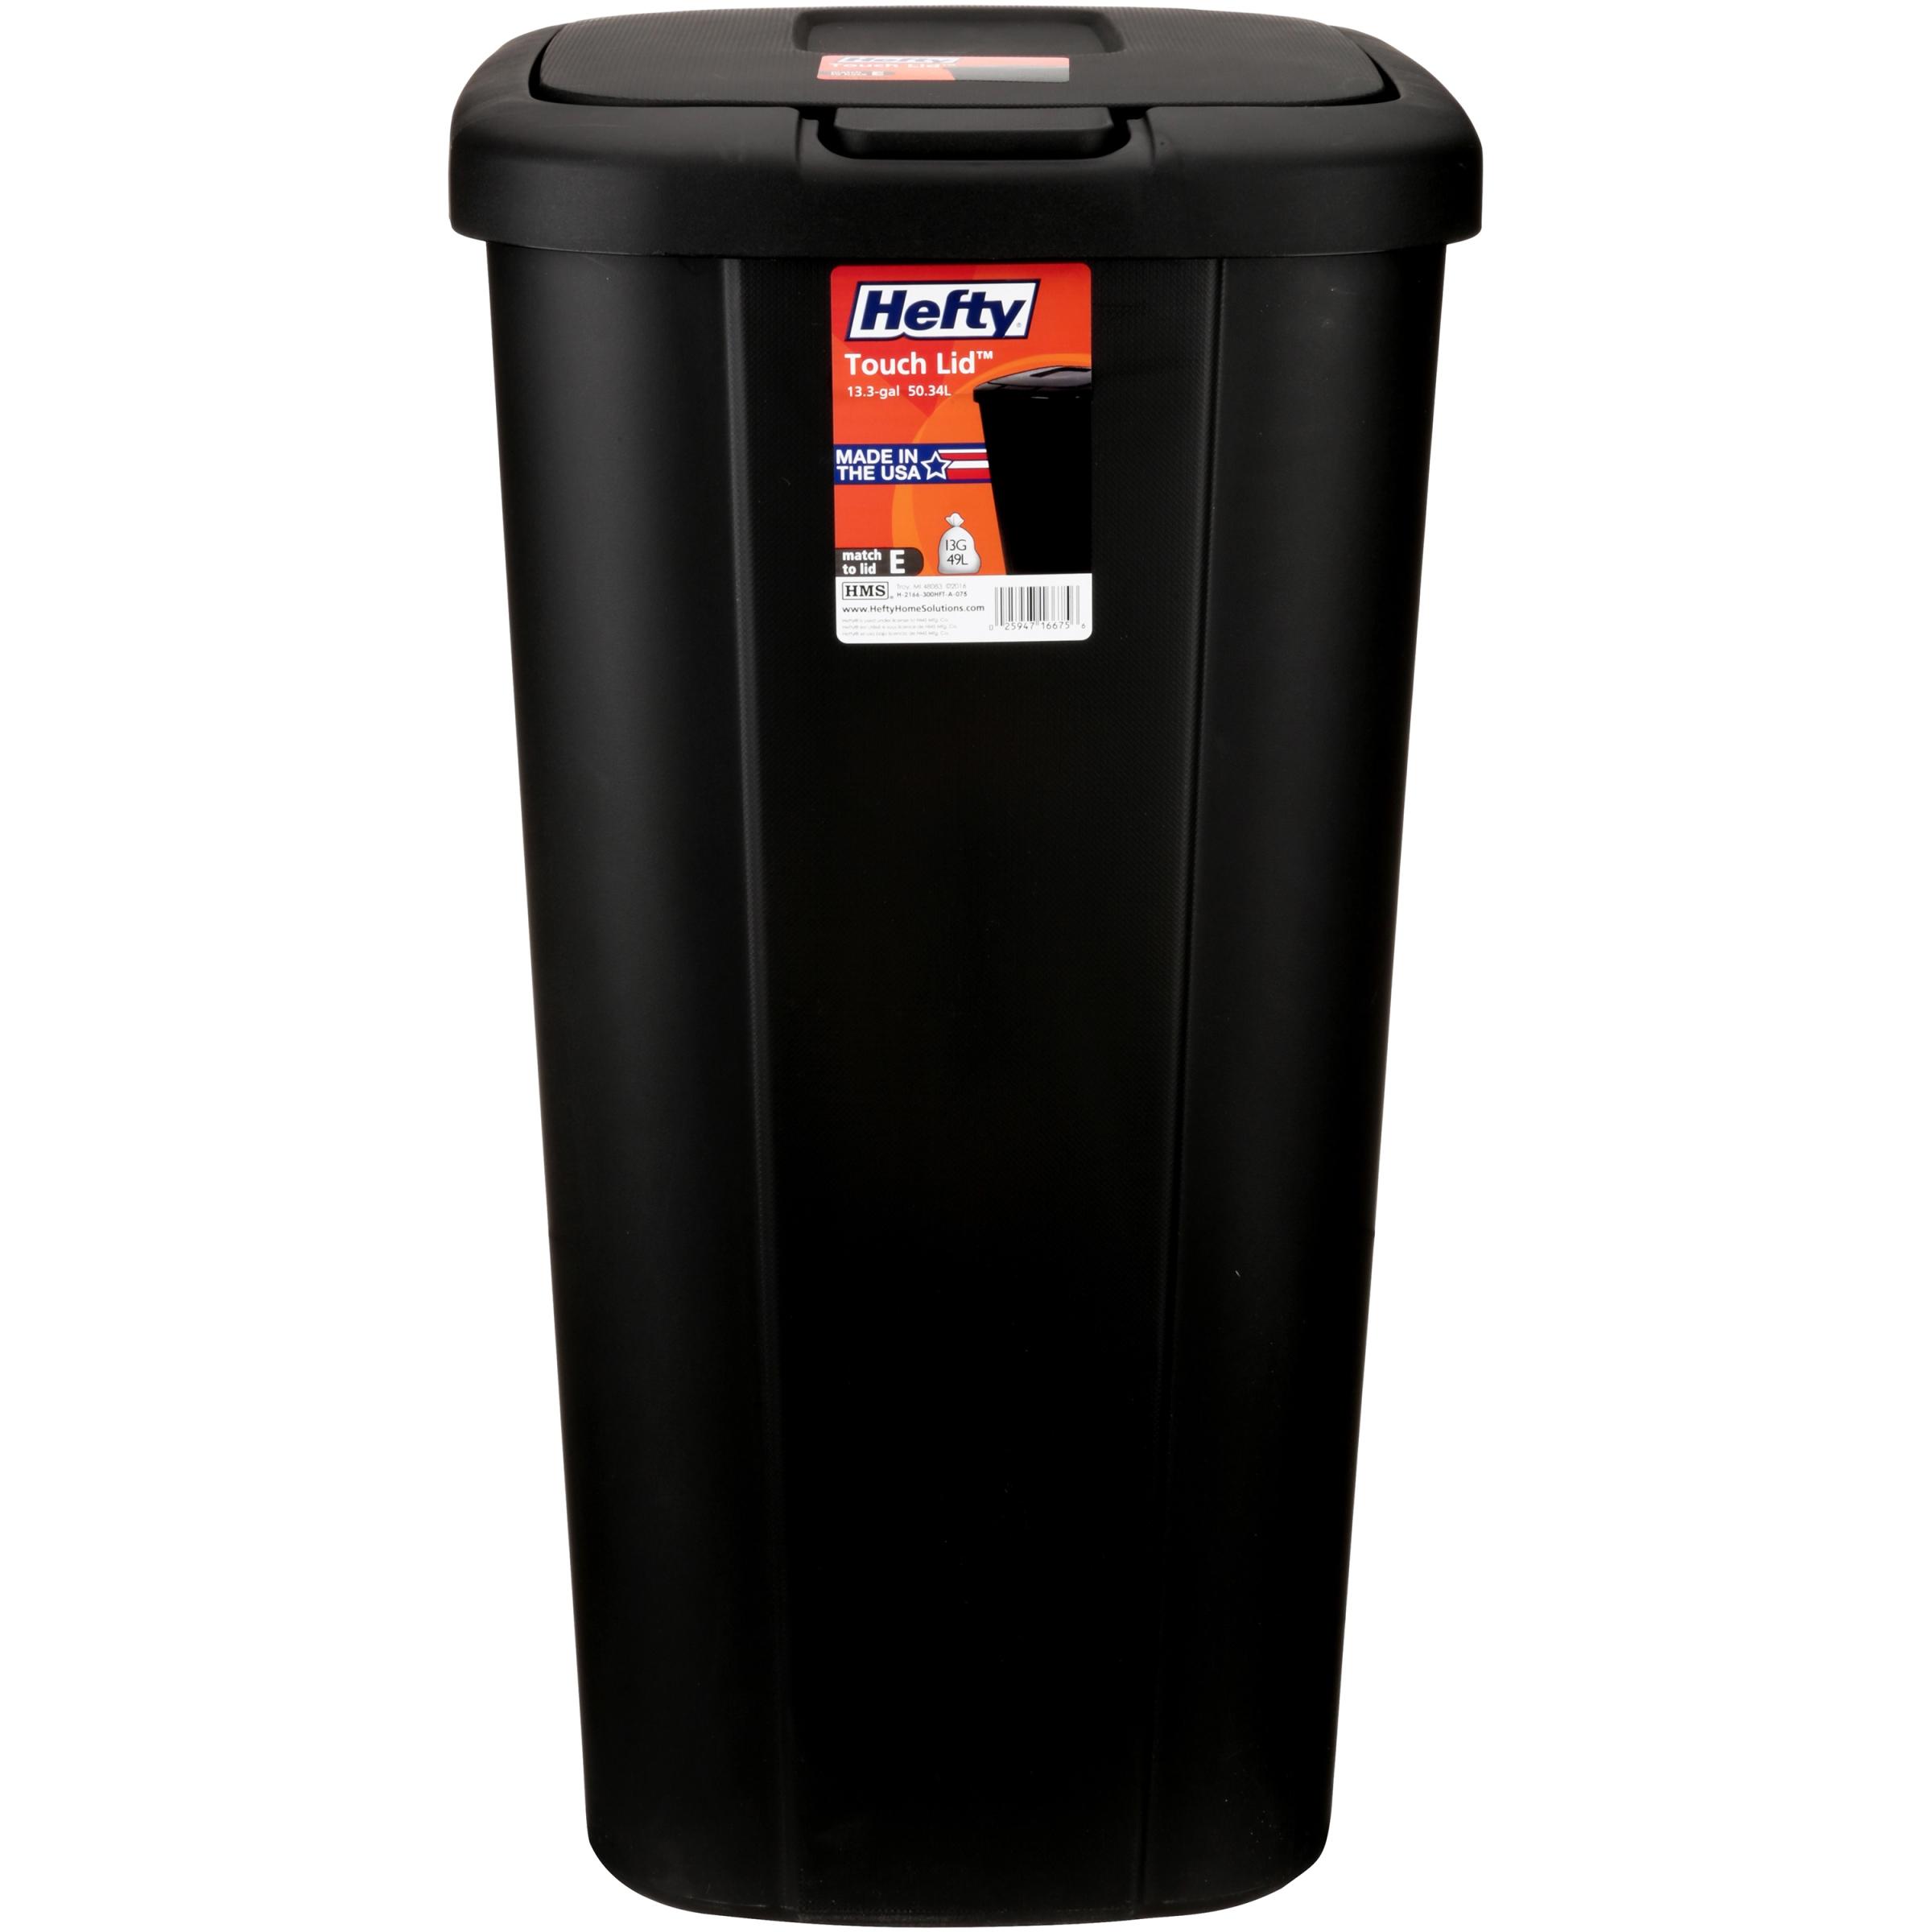 hefty trash can garbage 13 gallon bin touch lid spring loaded tall slim narrow ebay. Black Bedroom Furniture Sets. Home Design Ideas